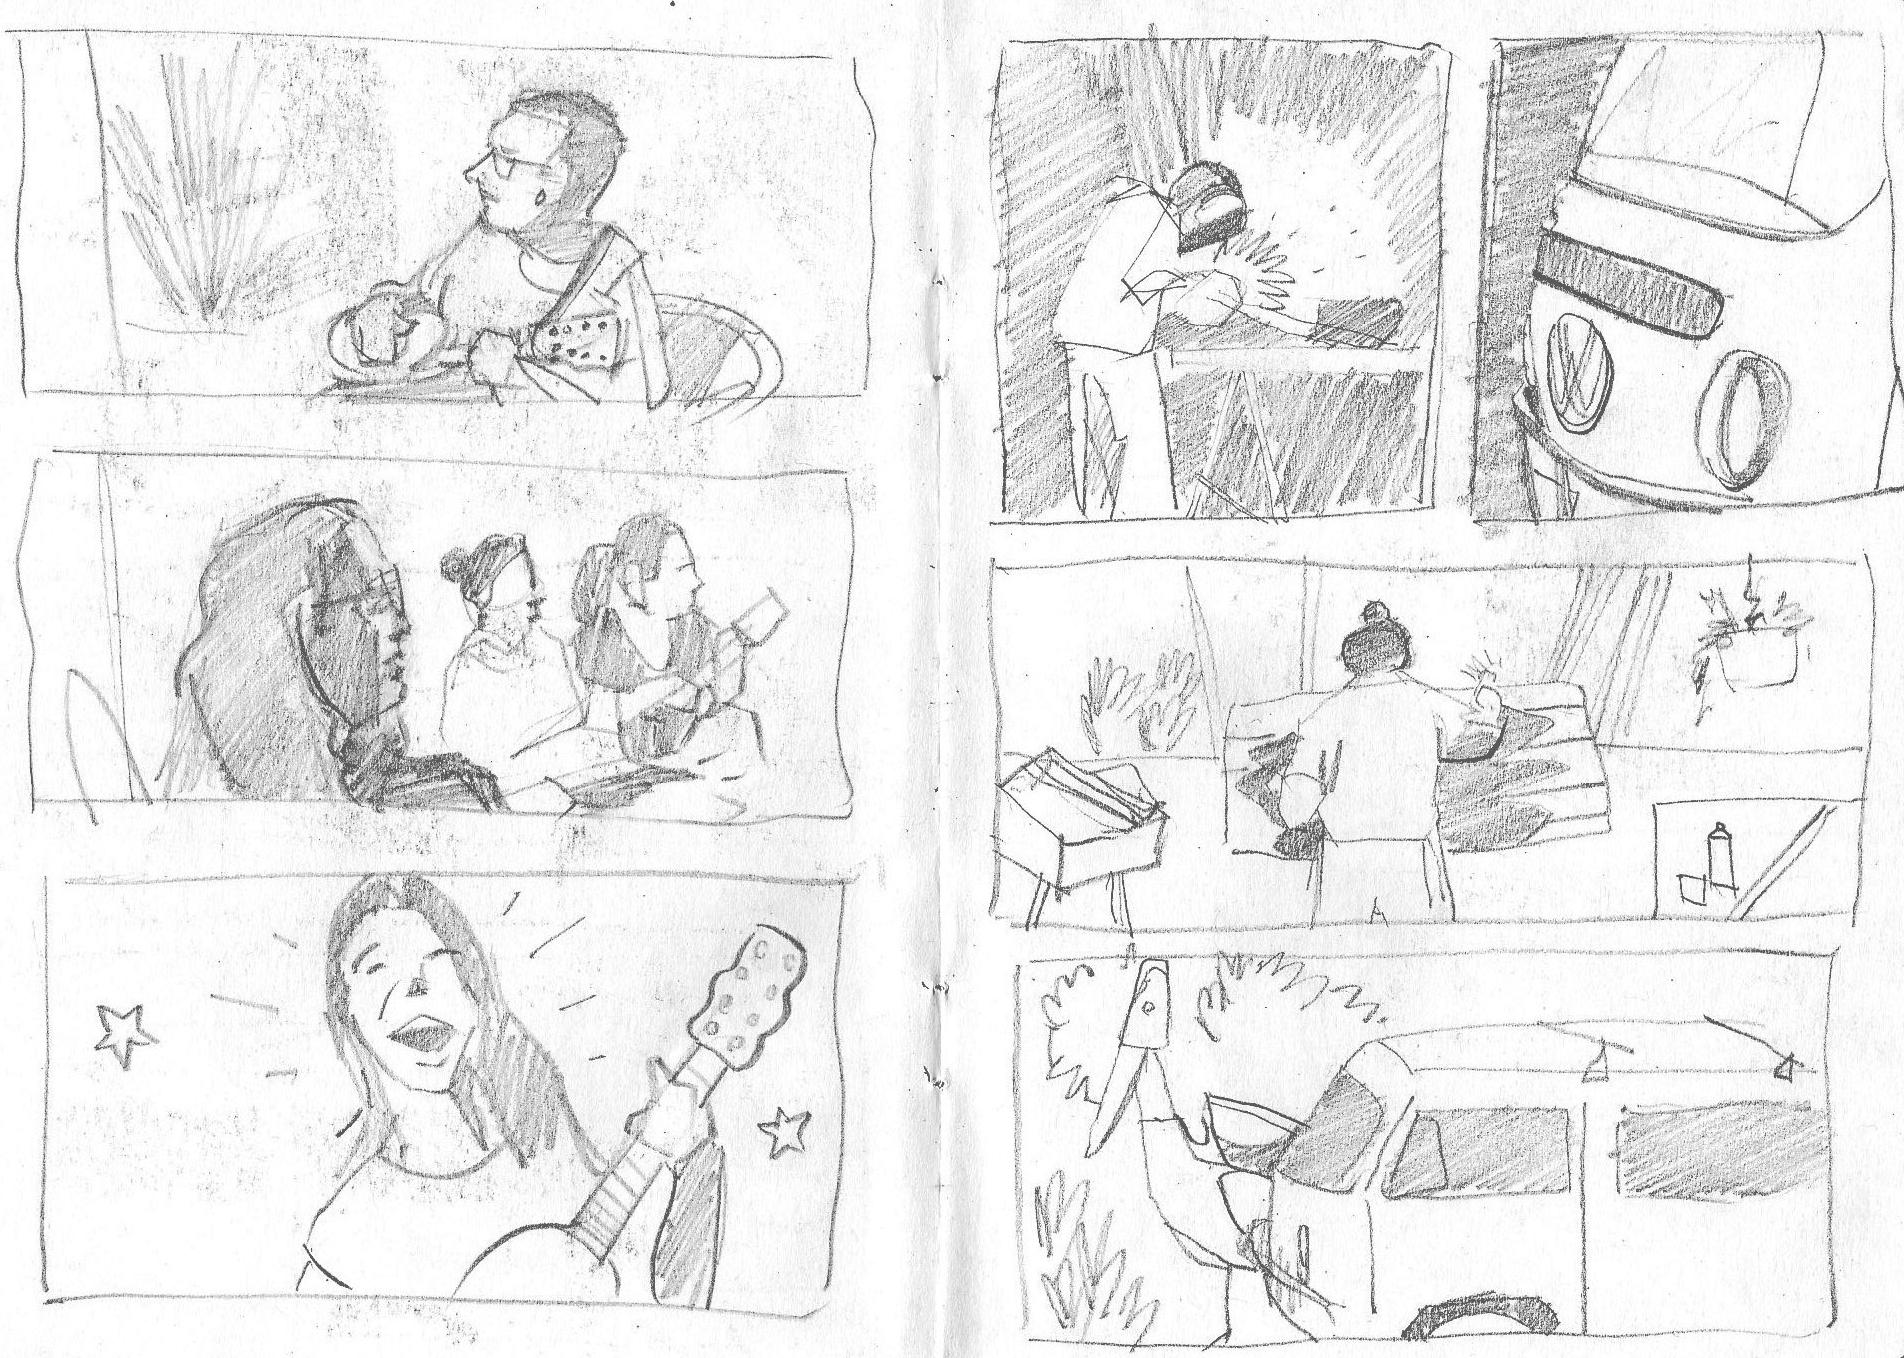 Sketchbookproject5.1.jpg